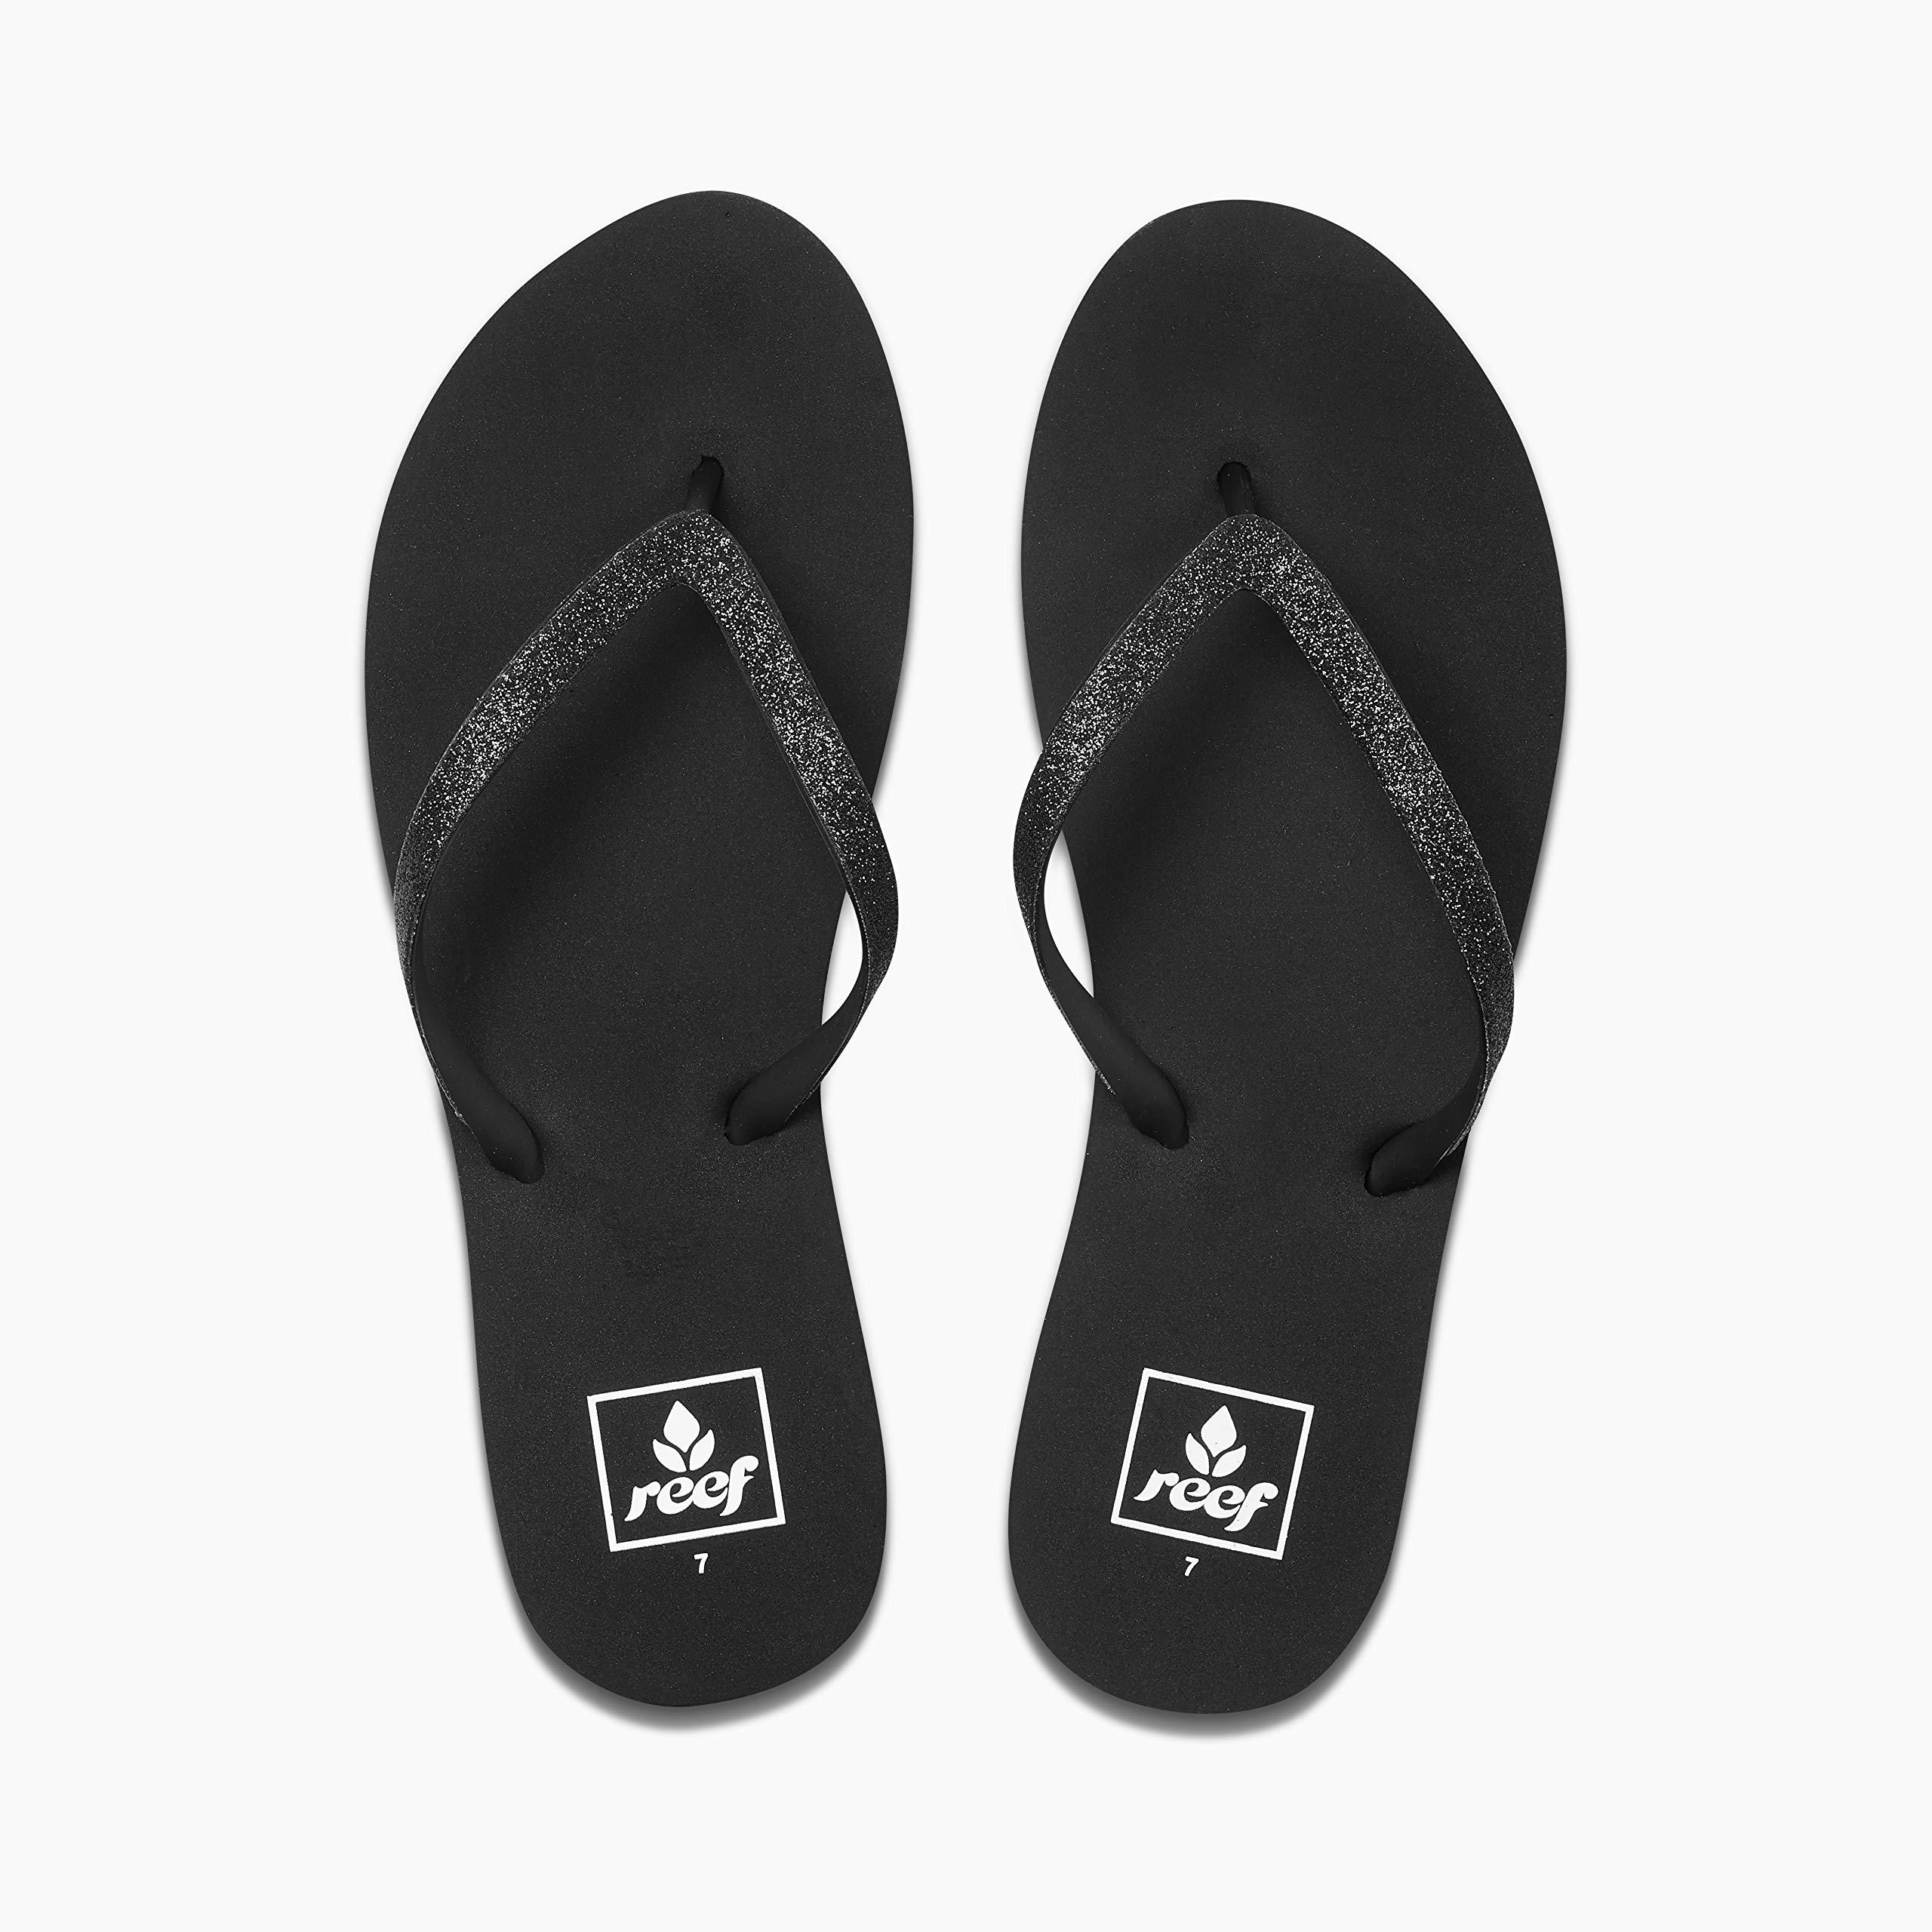 Reef Women's Stargazer Sandal,Black/Black,9 M US